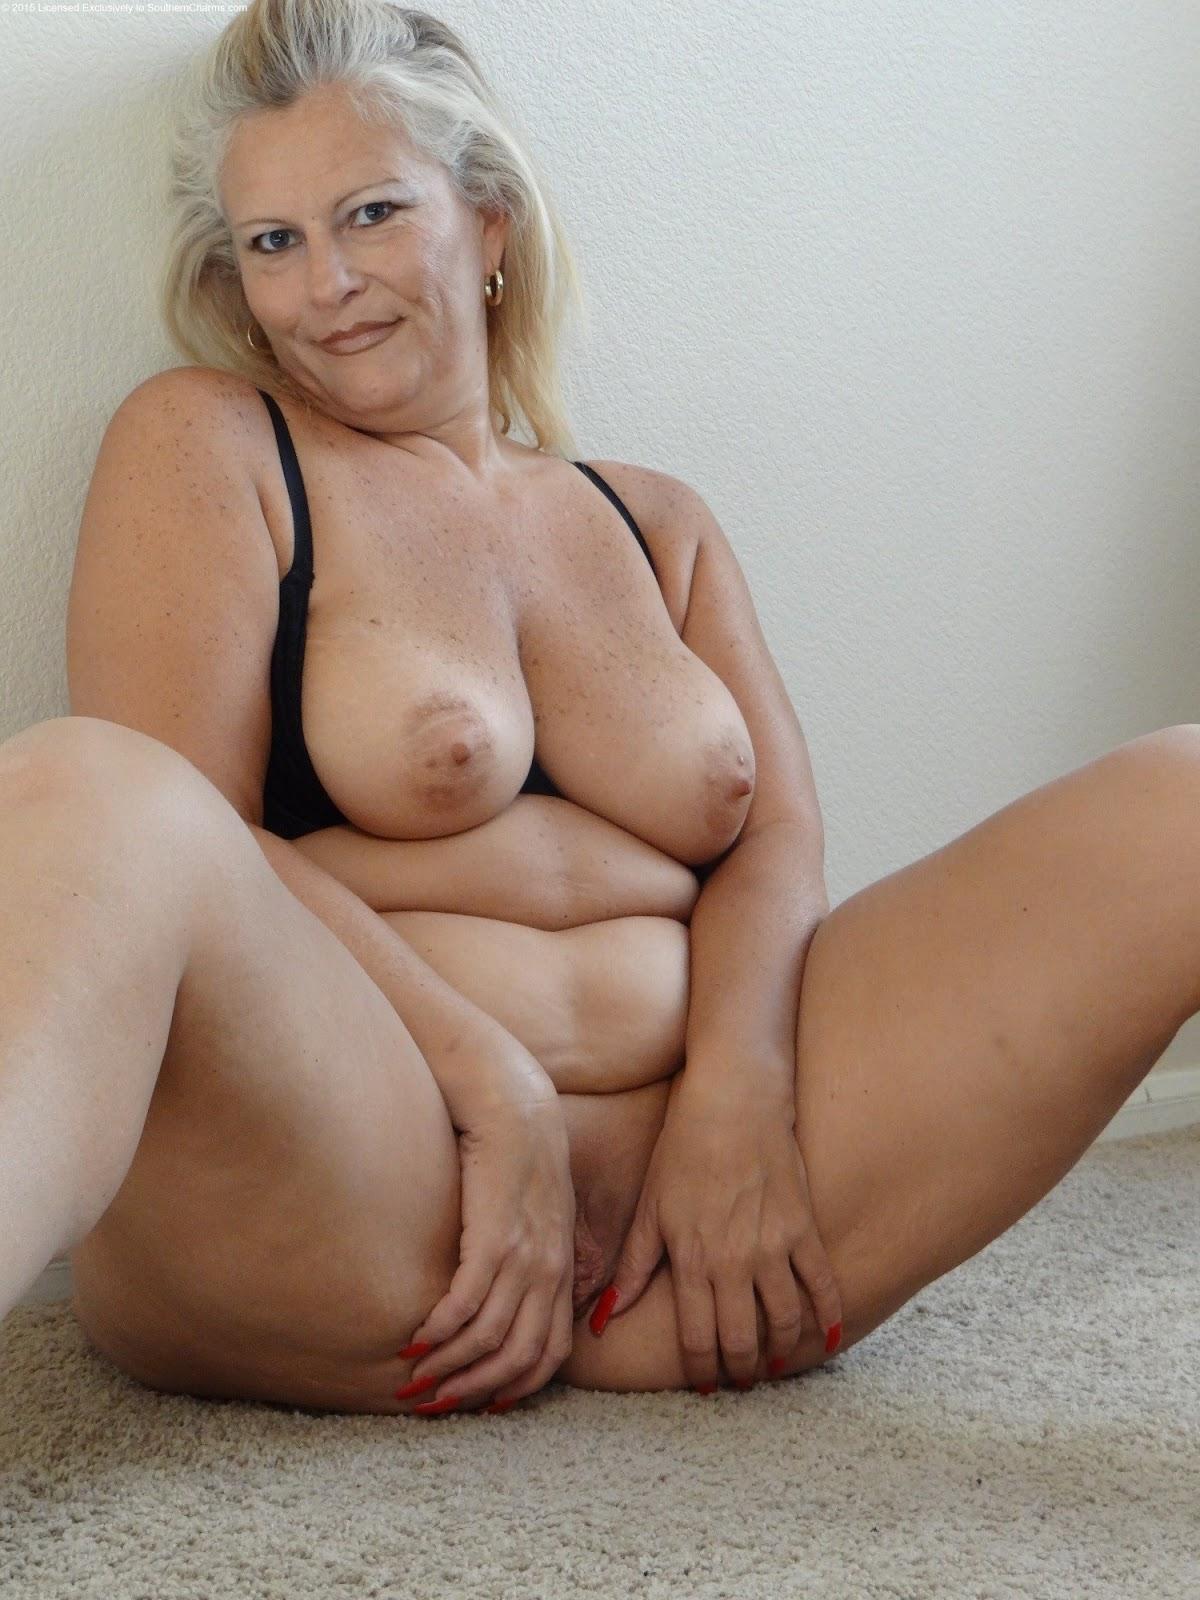 older women nude archives